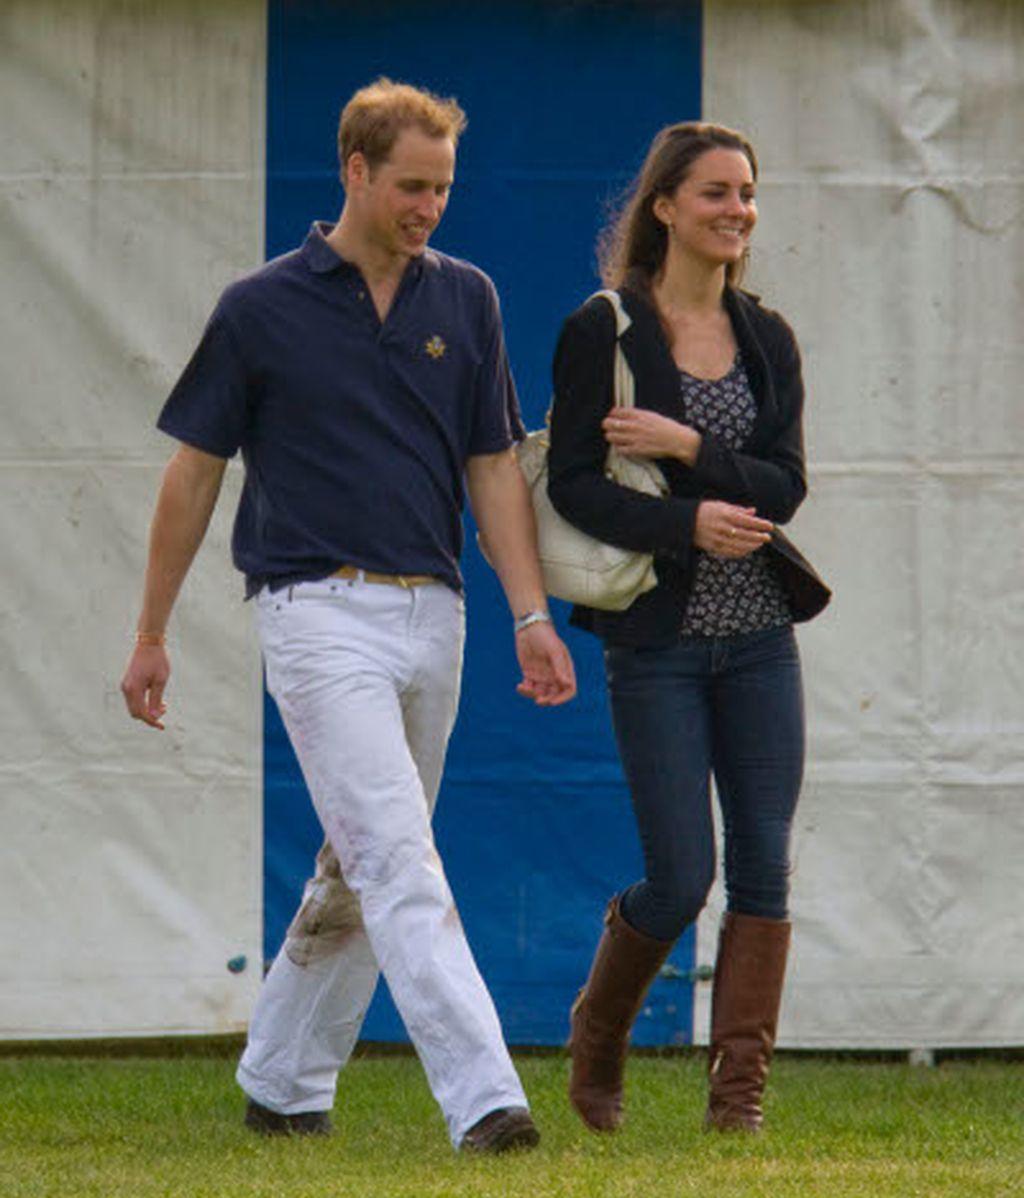 La vida de Kate Middleton en 10 imágenes